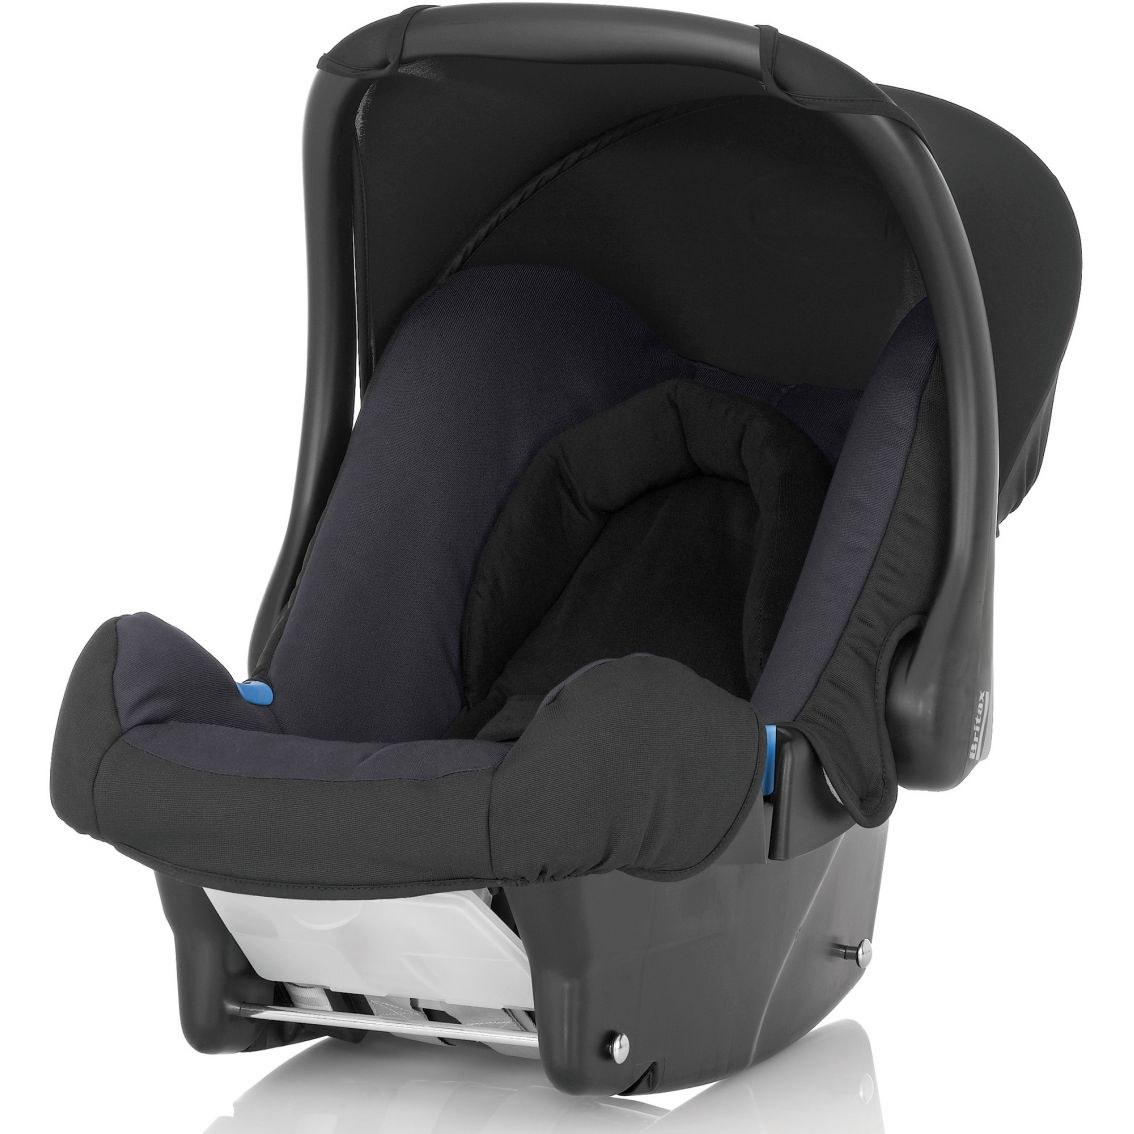 Car seats under £100 - Good Egg Car Safety